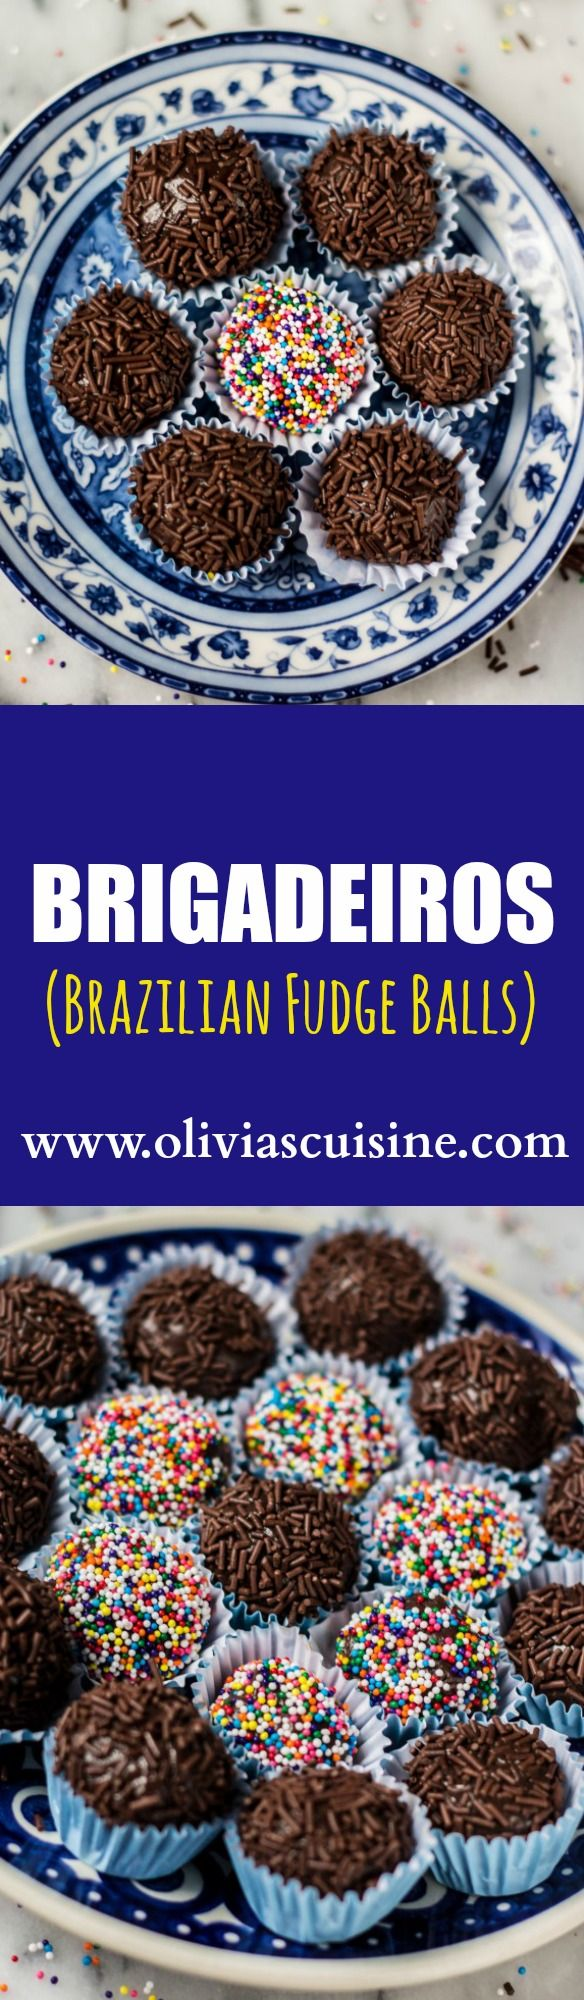 Traditional Brigadeiro (Brazilian Fudge Balls) | www.oliviascuisine.com | Brazil's favorite dessert: brigadeiro. Chocolate fudge balls made with sweet condensed milk, butter and cocoa powder. So addicting!